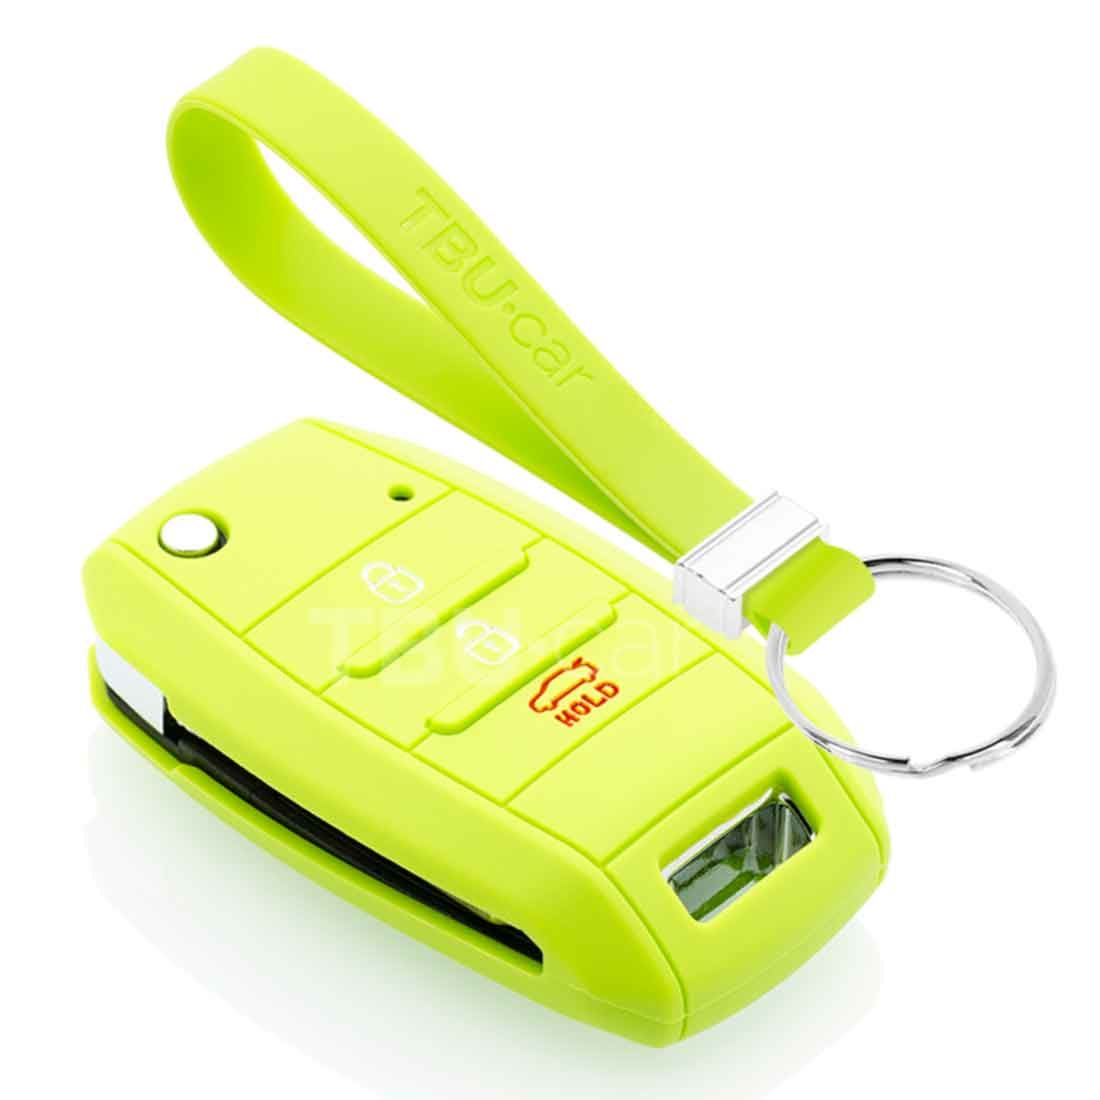 TBU car TBU car Autoschlüssel Hülle kompatibel mit Kia 3 Tasten - Schutzhülle aus Silikon - Auto Schlüsselhülle Cover in Hellgrün